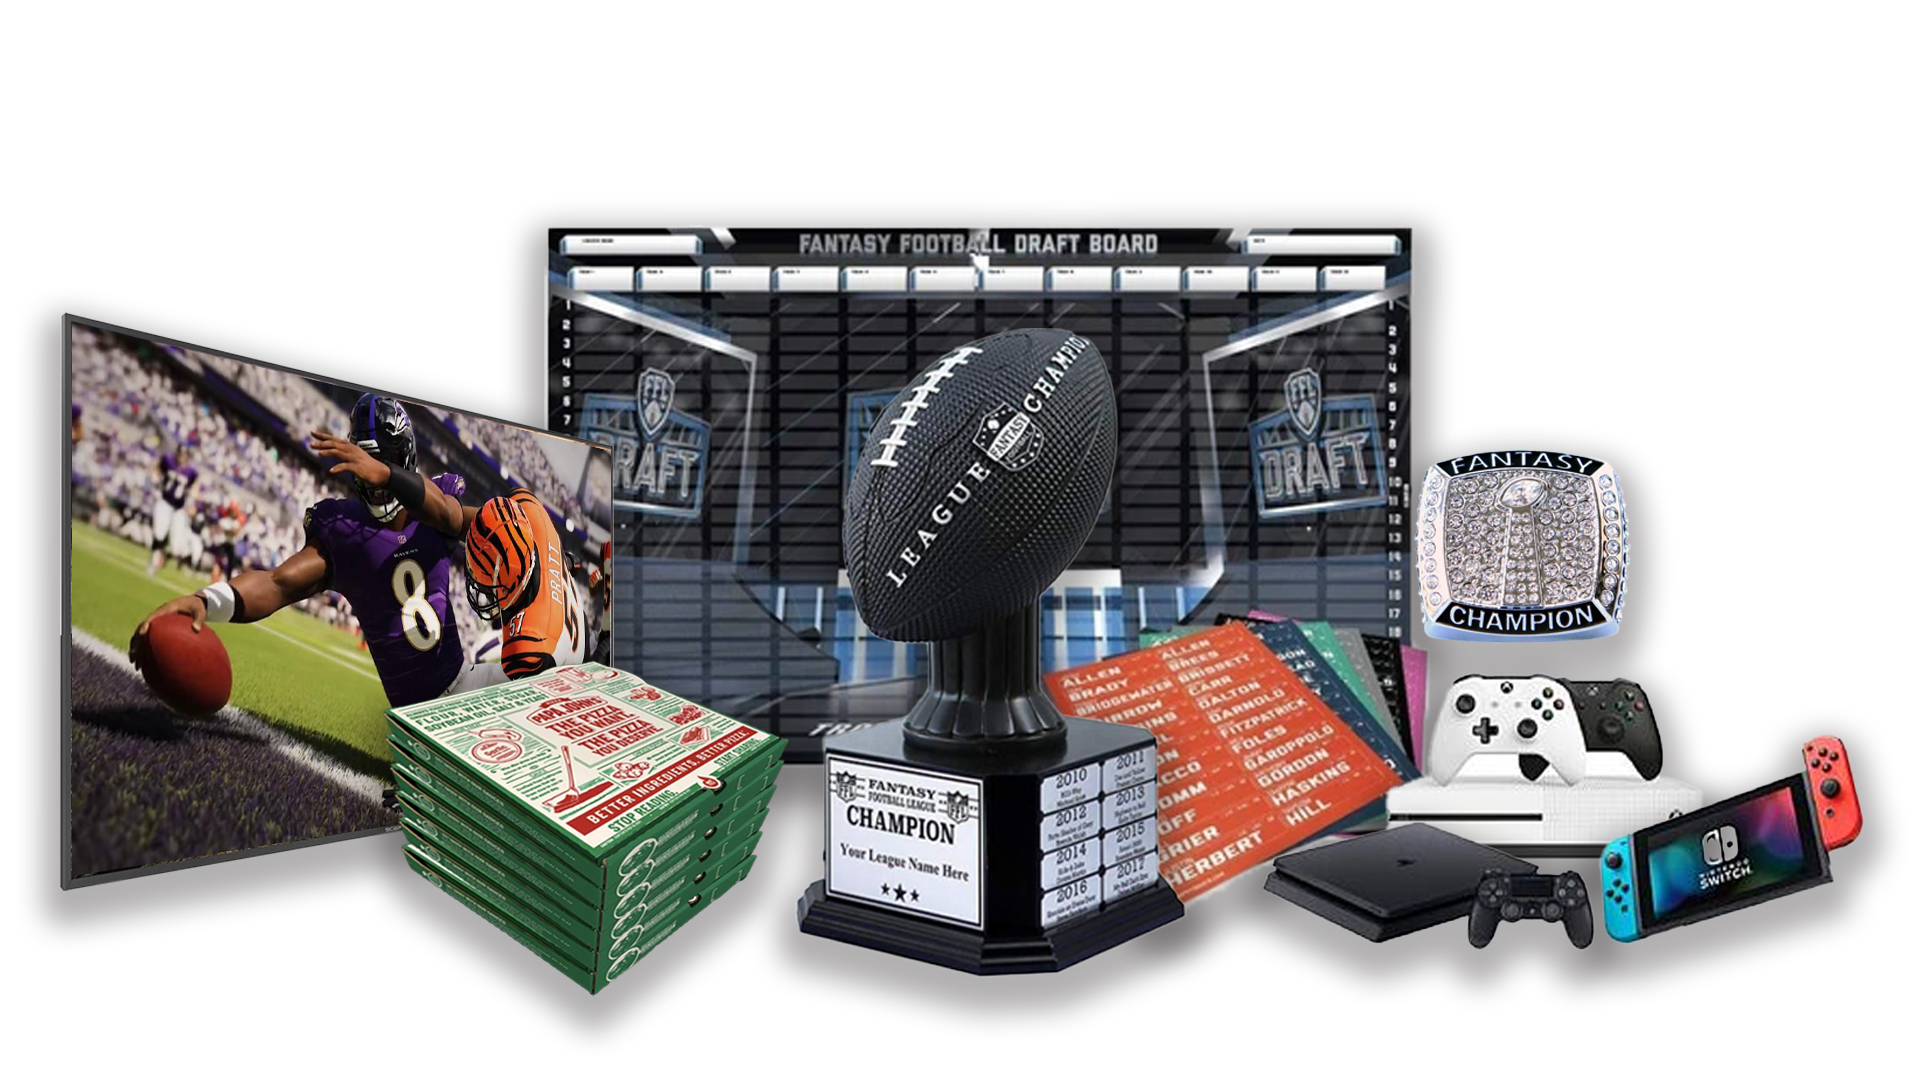 - FFDraft Trophy Black Pizza - Fantasy Football Draft Parties at 1Life2Play